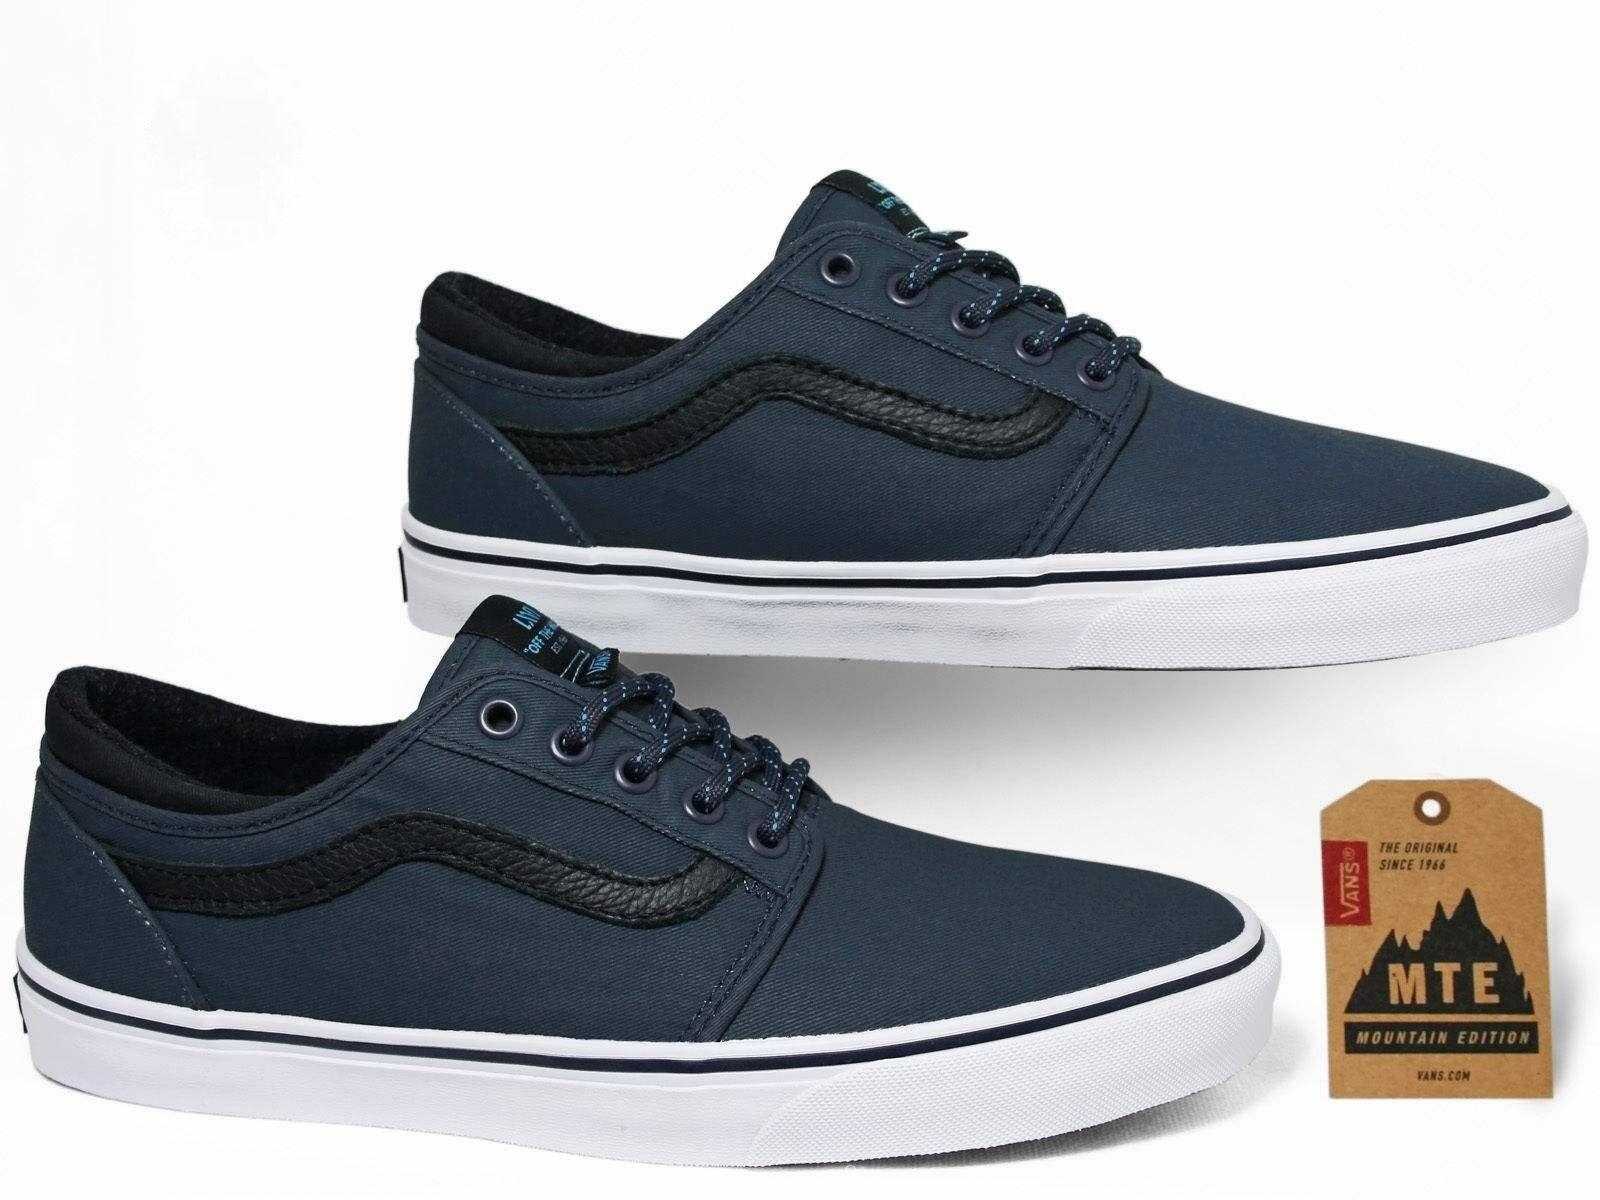 Vans Trig Ombre Mte Ombre Trig Azul/blanco Para Hombre Classic Skate Zapatos 8 9f9259